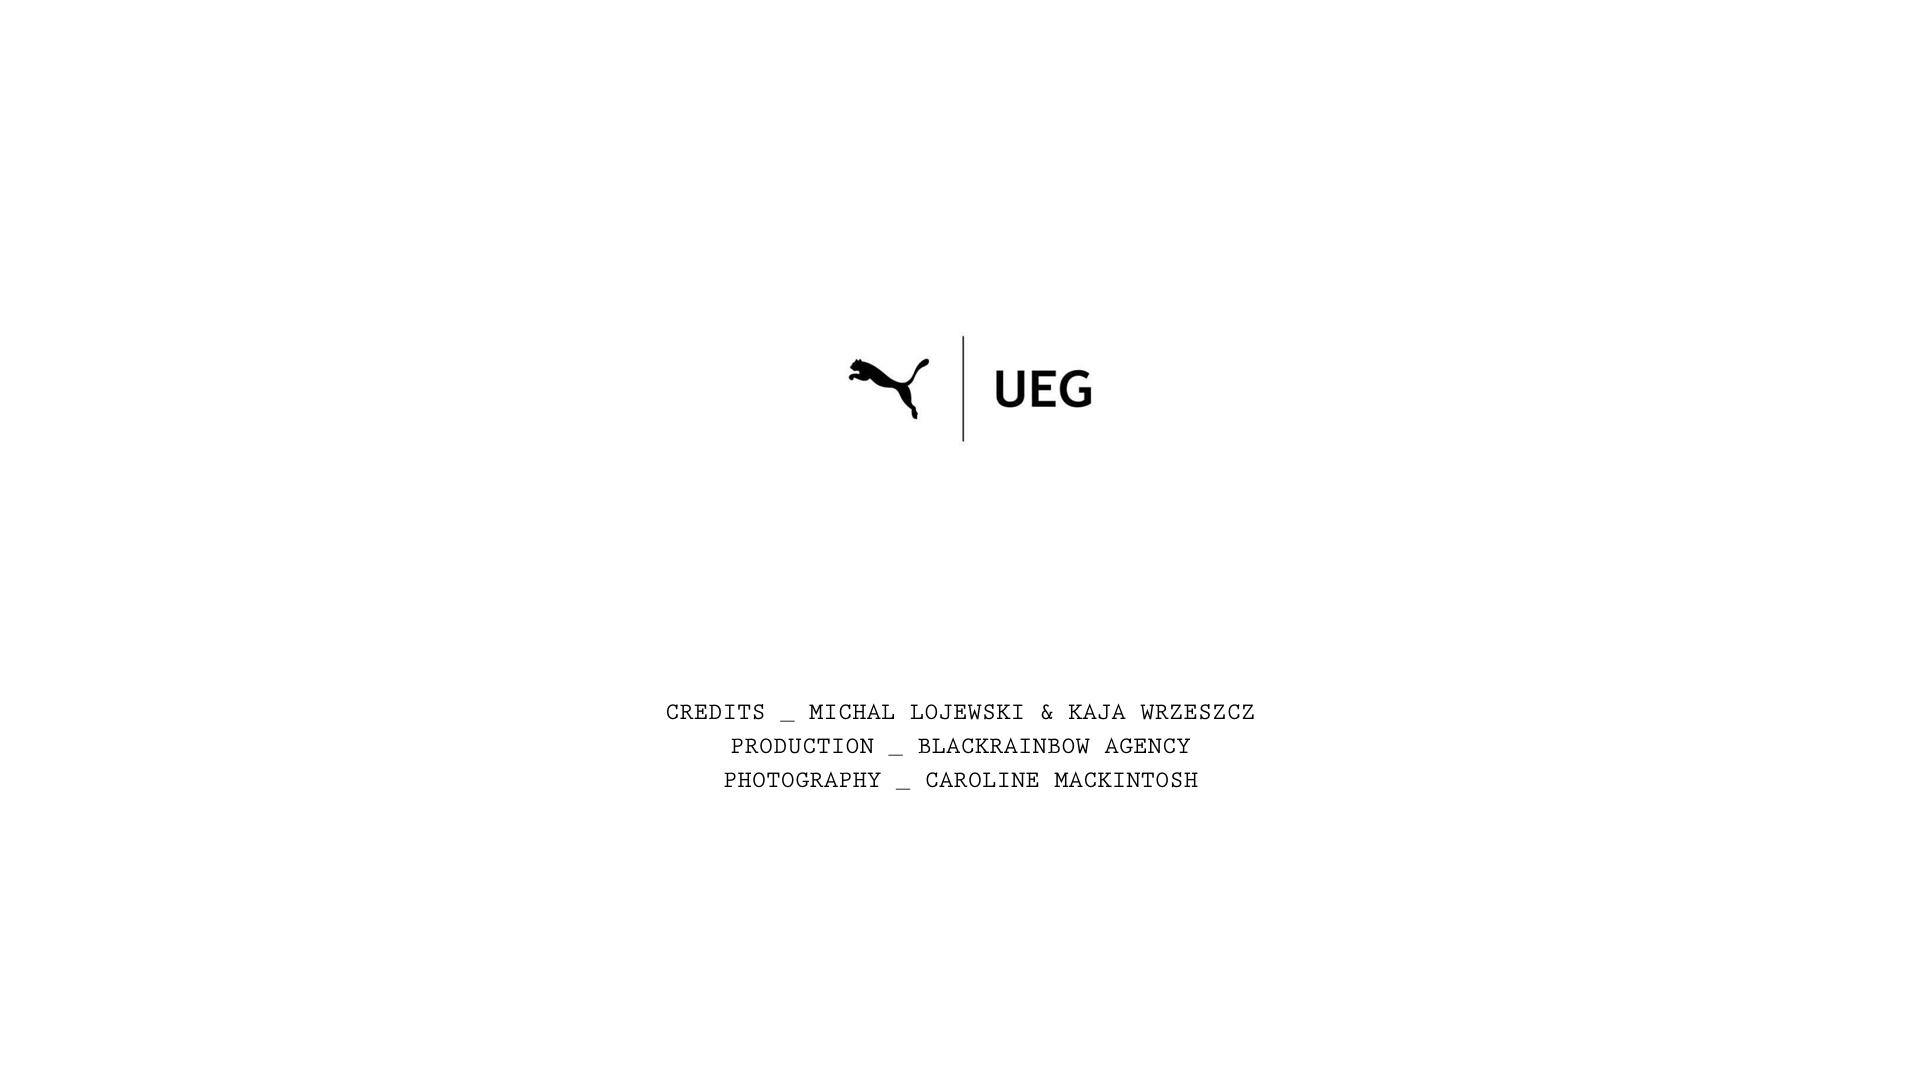 PUMA X UEG X BKRW.001.jpeg